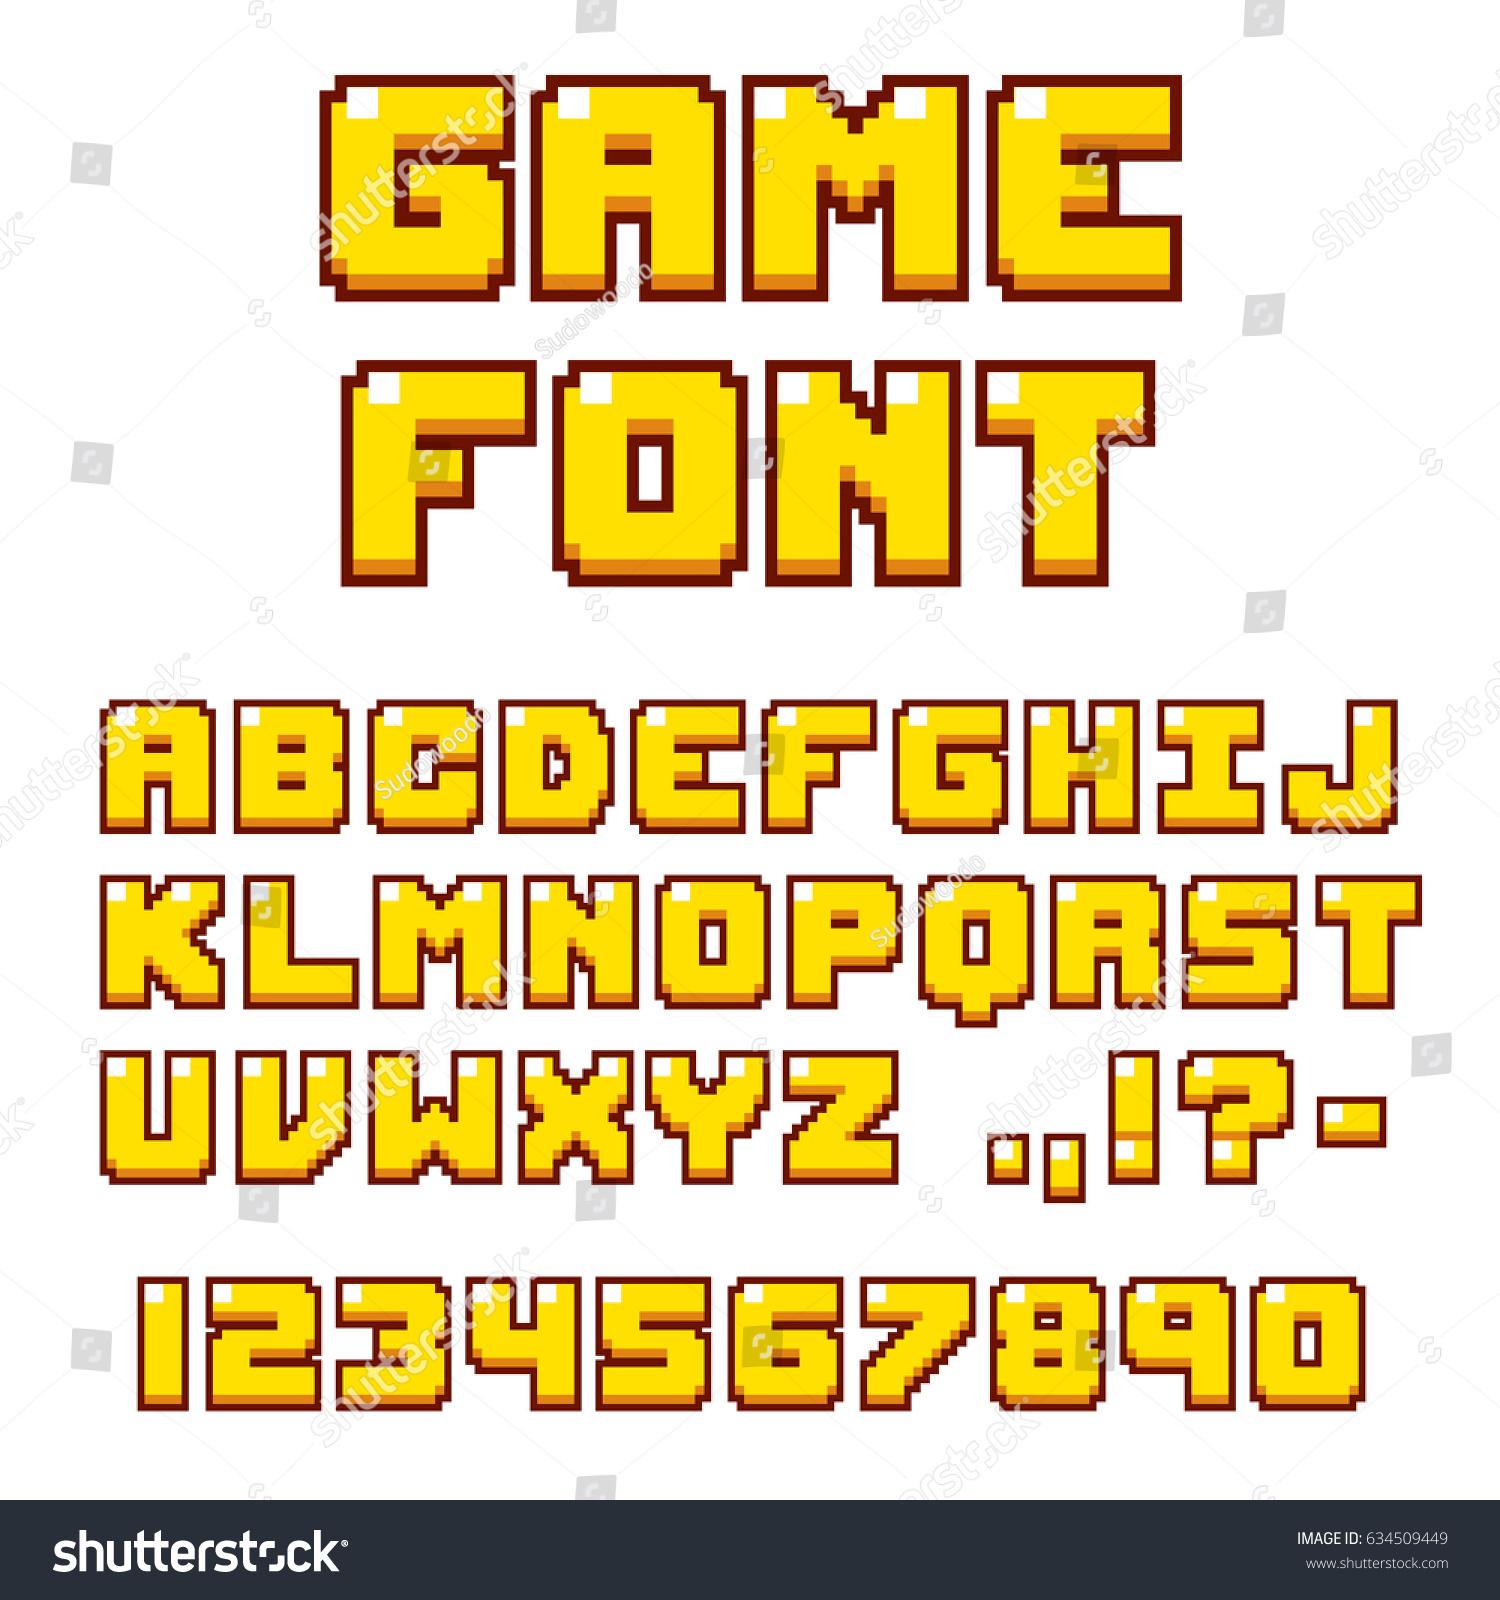 Pixel Video Game Font 8bit Symbols Stock Illustration